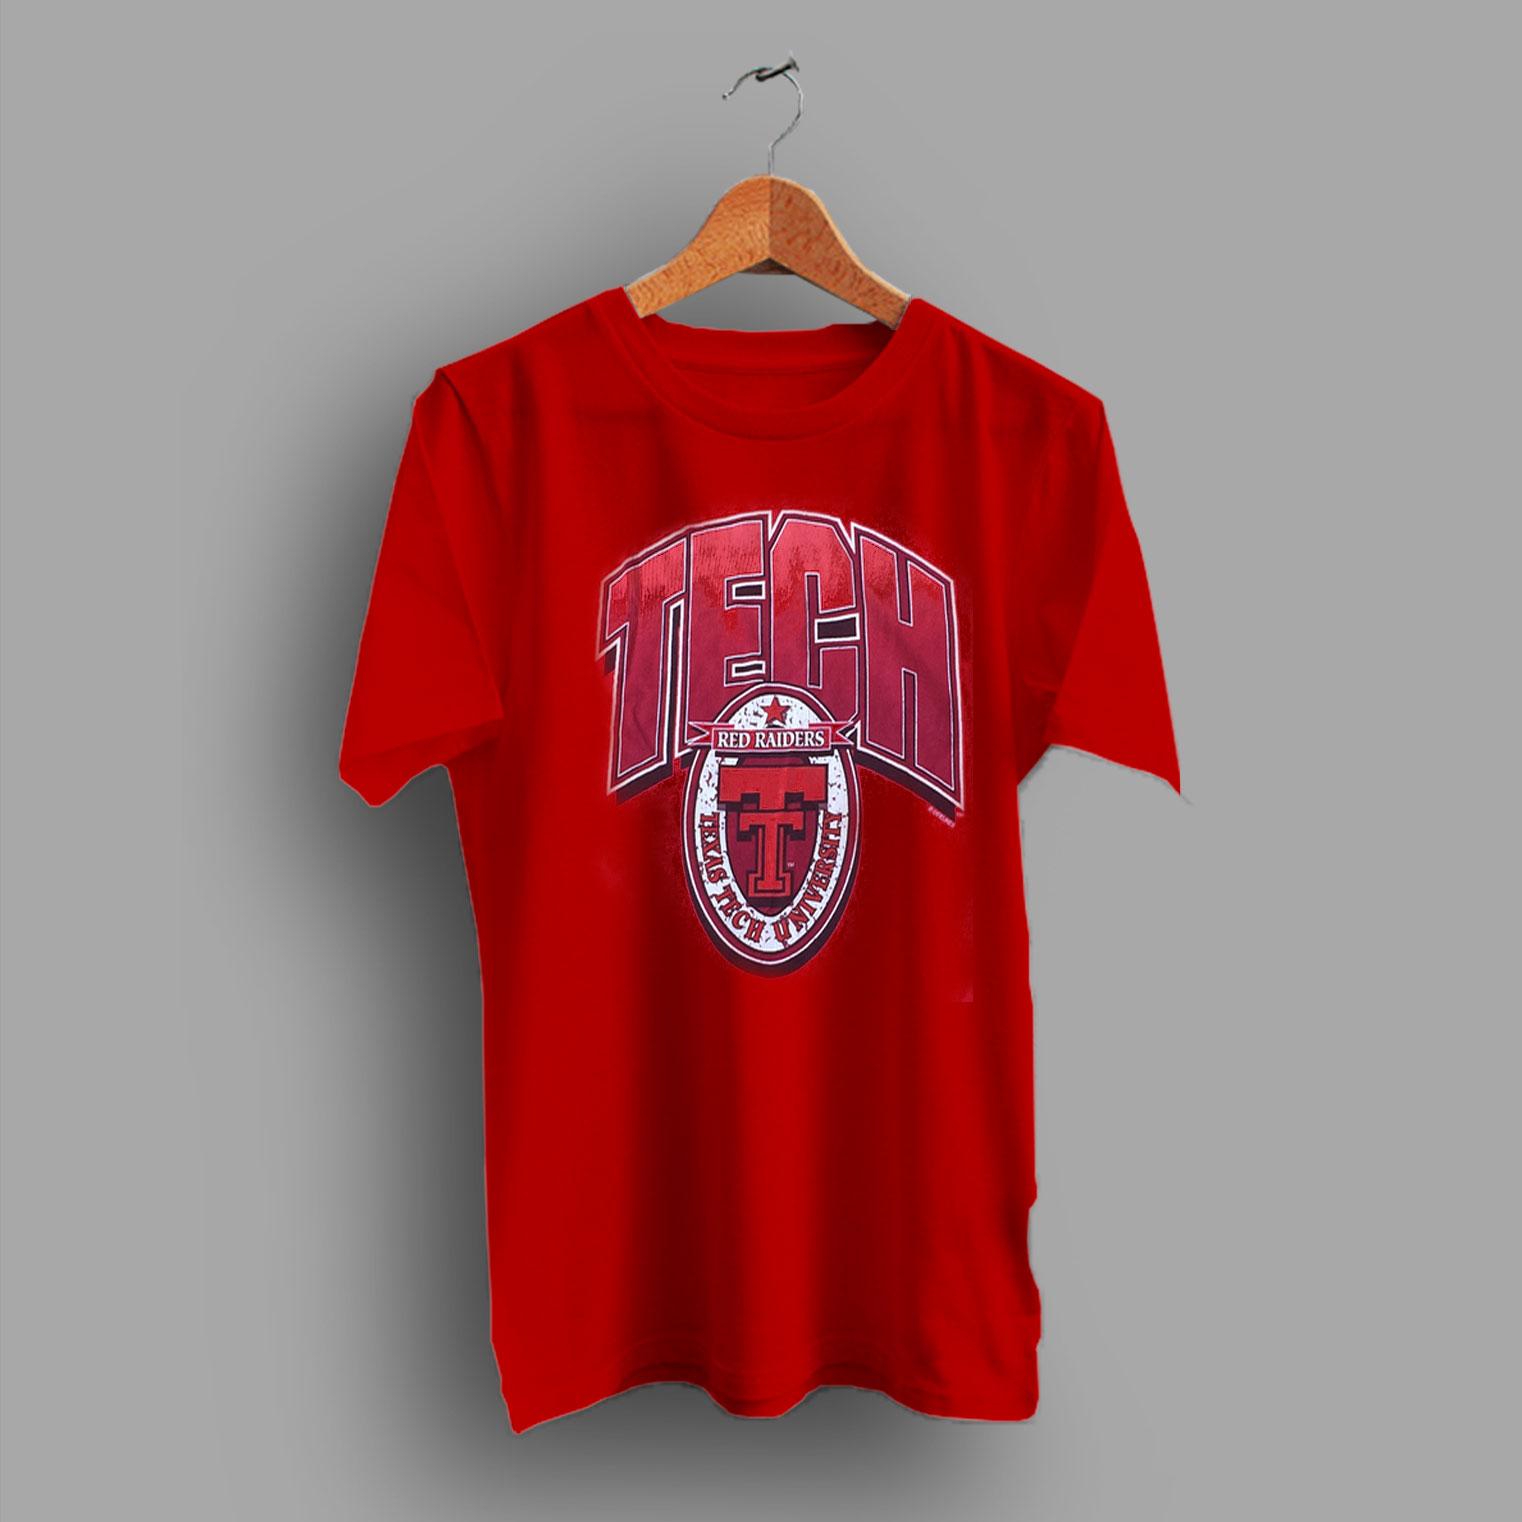 Red Raiders Football Vintage Texas Tech Lubbock College T